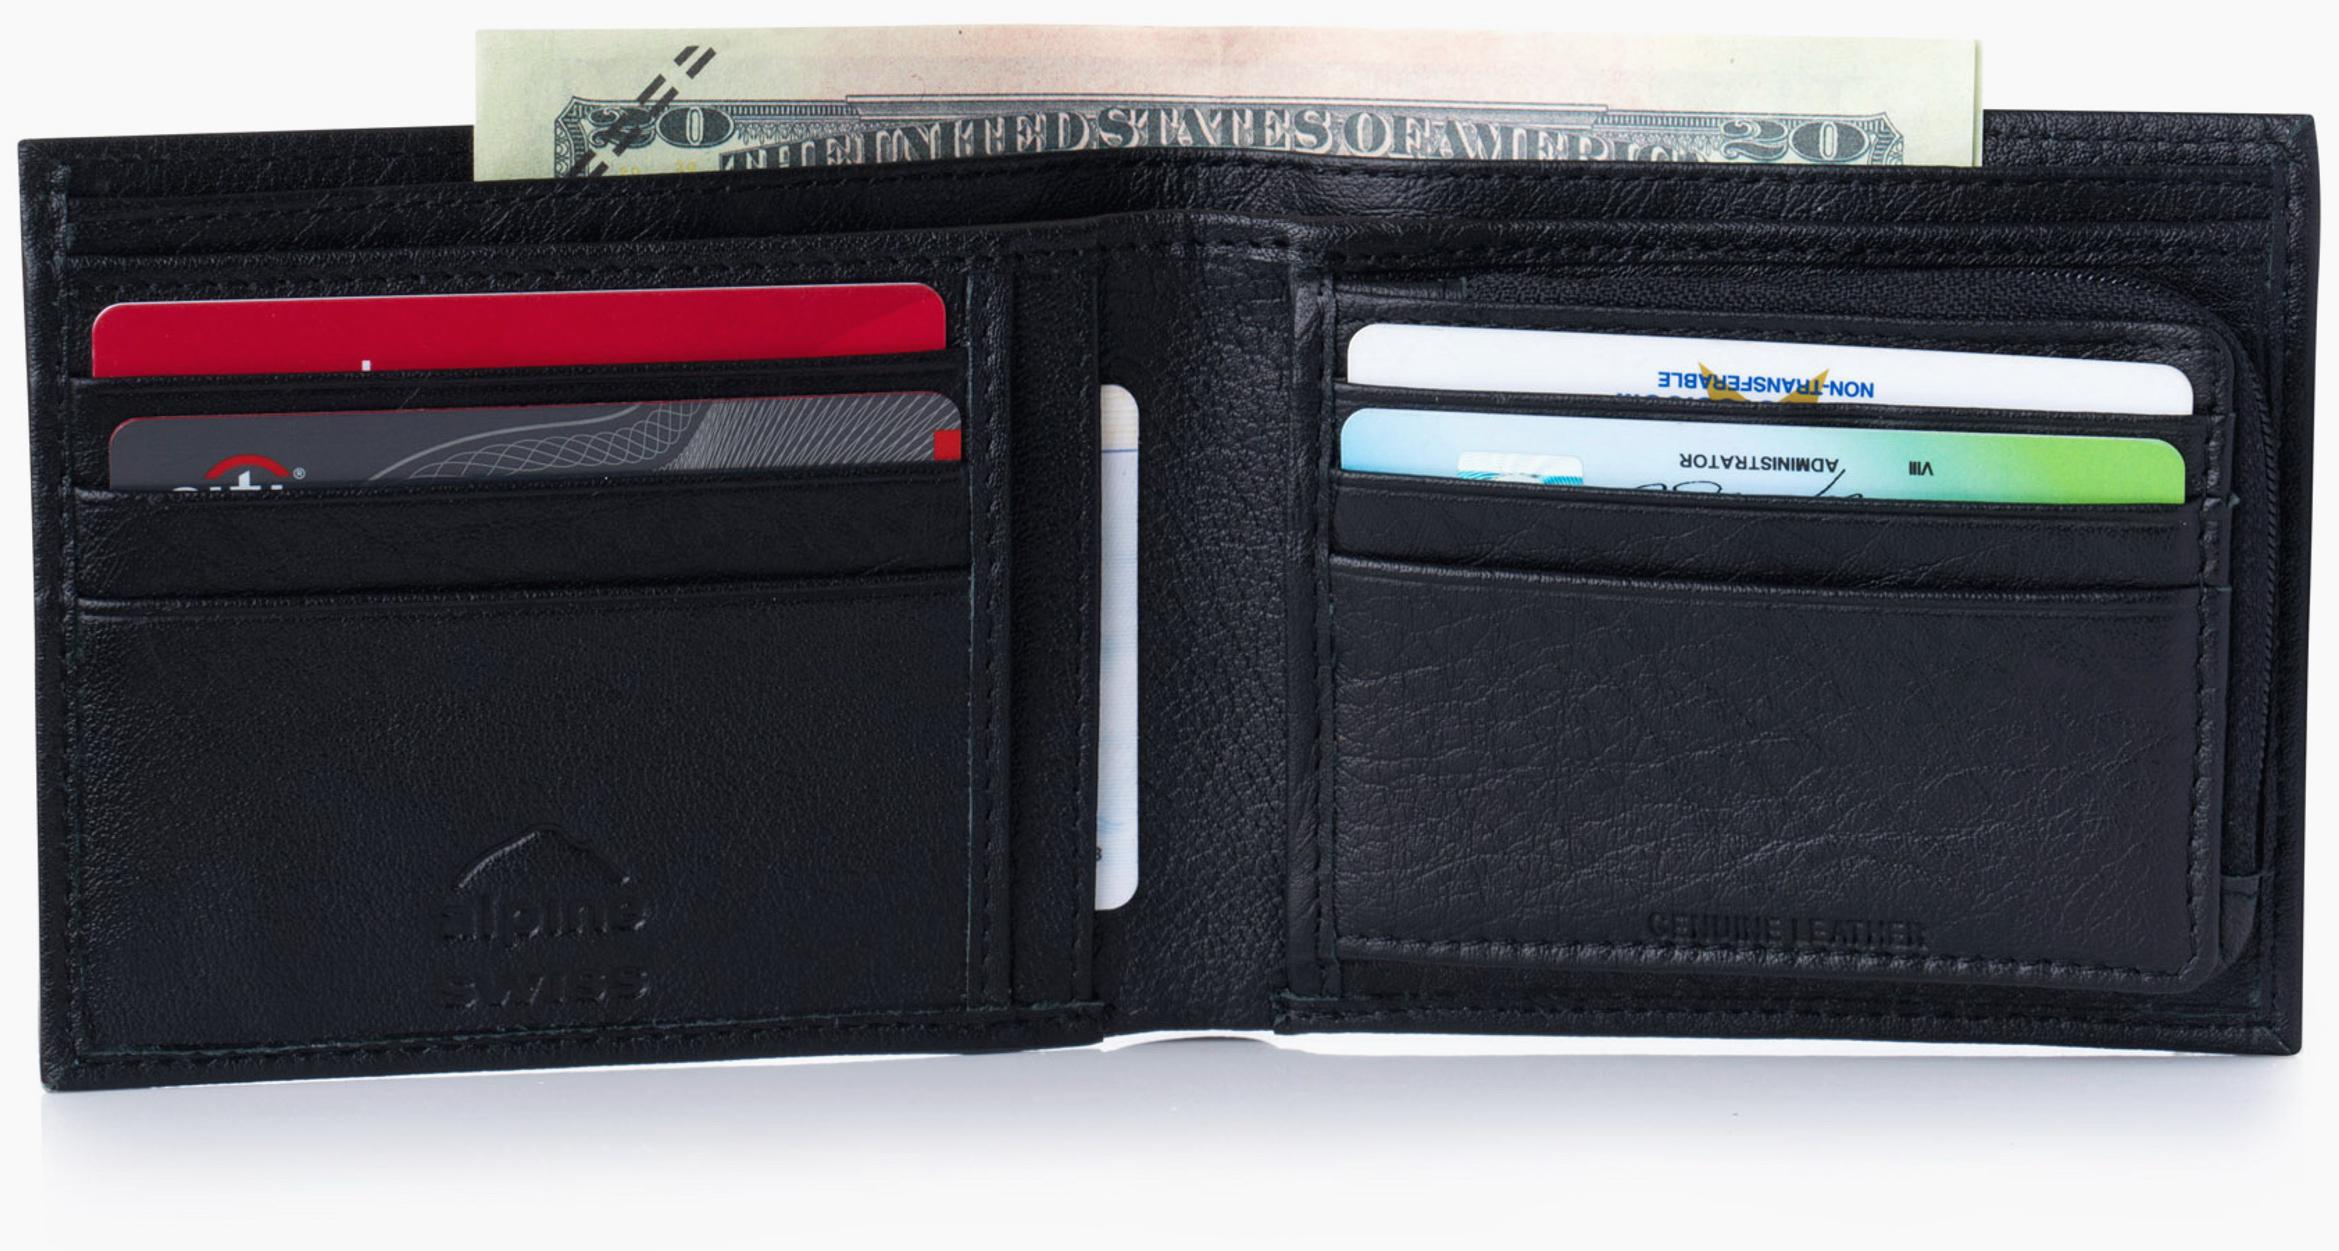 acb14e6ea2a64 Alpine Swiss Mens Leather Wallet Zipper Coin Pocket 2 Billfold Multi ...